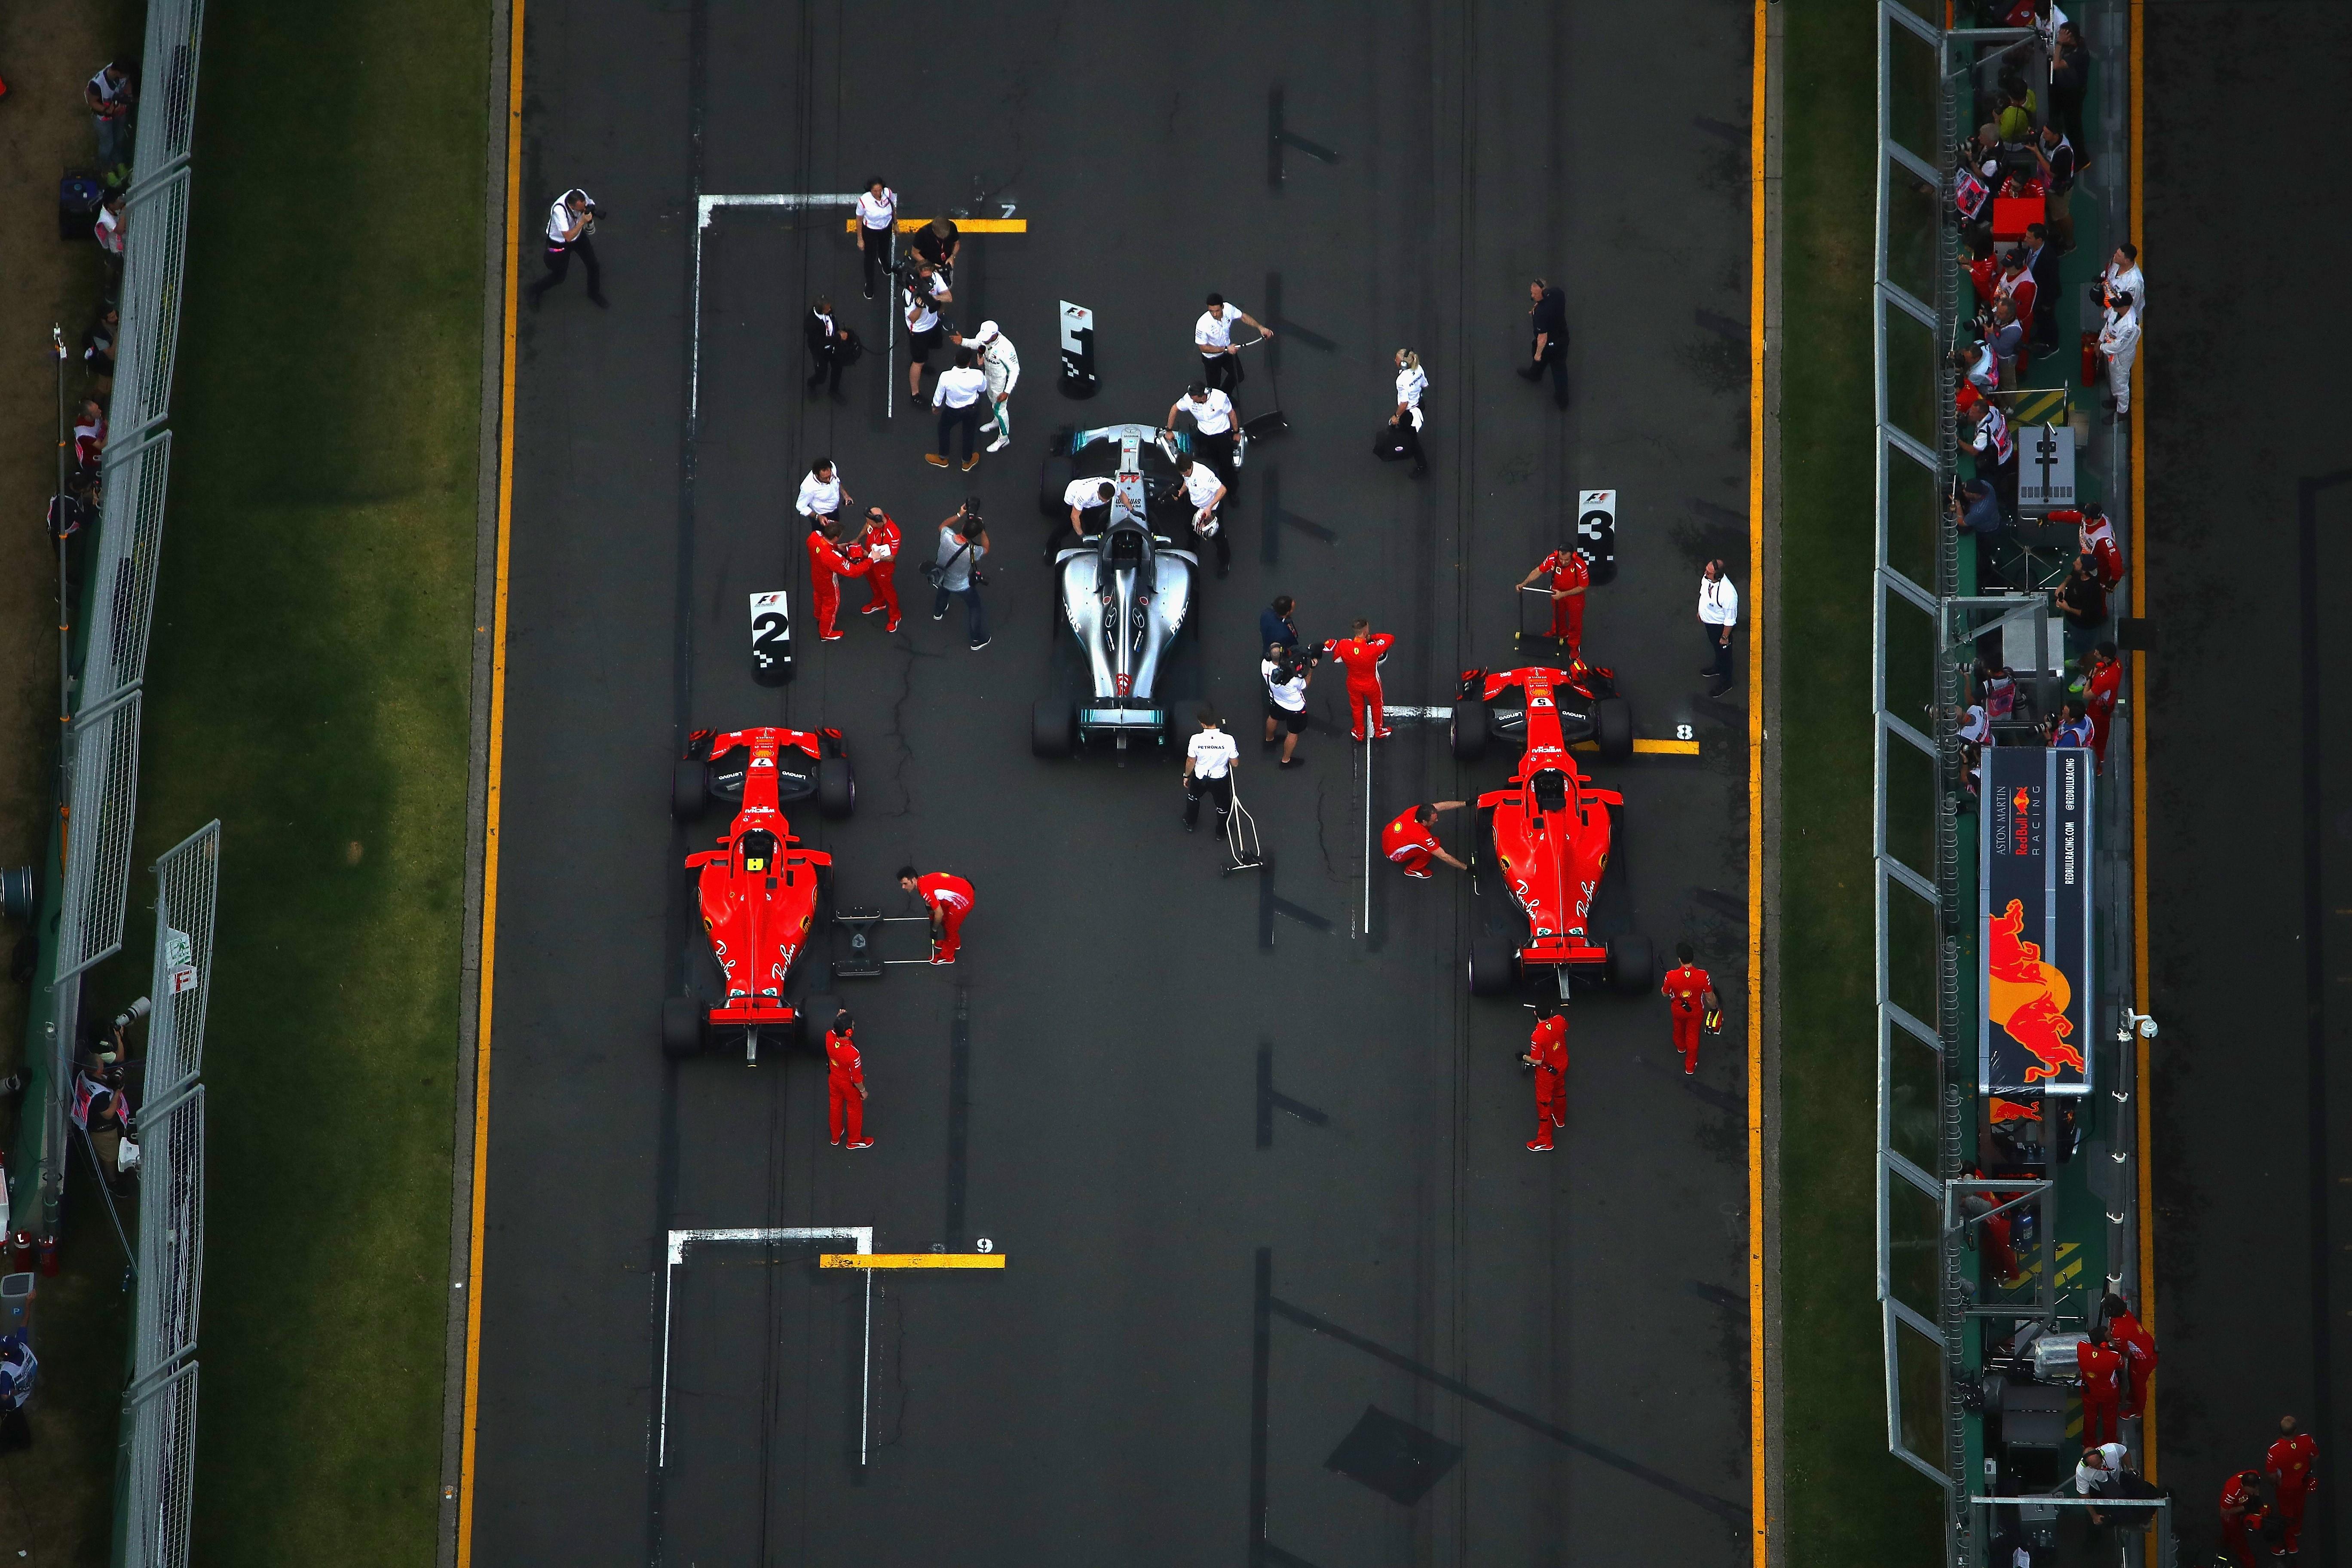 Lewis Hamilton (Mercedes), Kimi Räikkönen et Sebastian Vettel (Ferrari) au Grand Prix d'Australie 2018